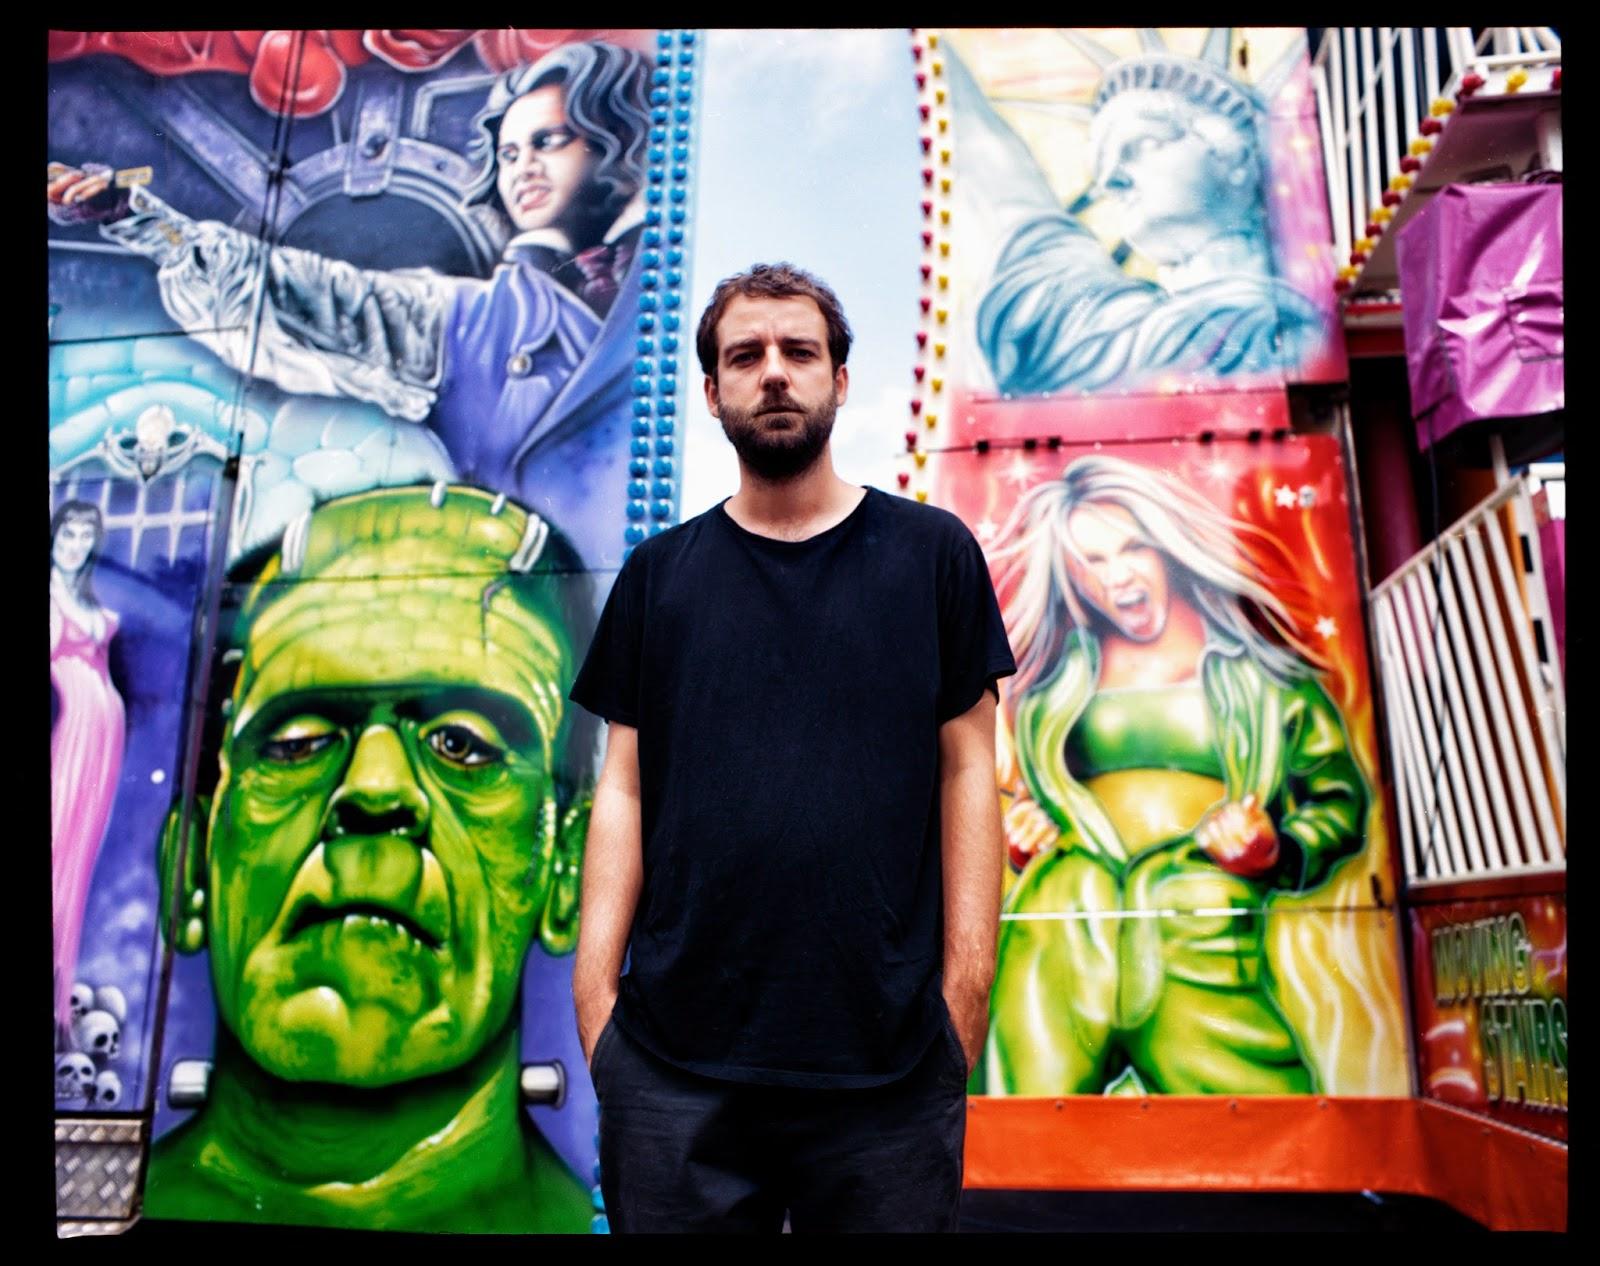 Deptford Goth Singer/Songwriter New Album Graffiti background smooth